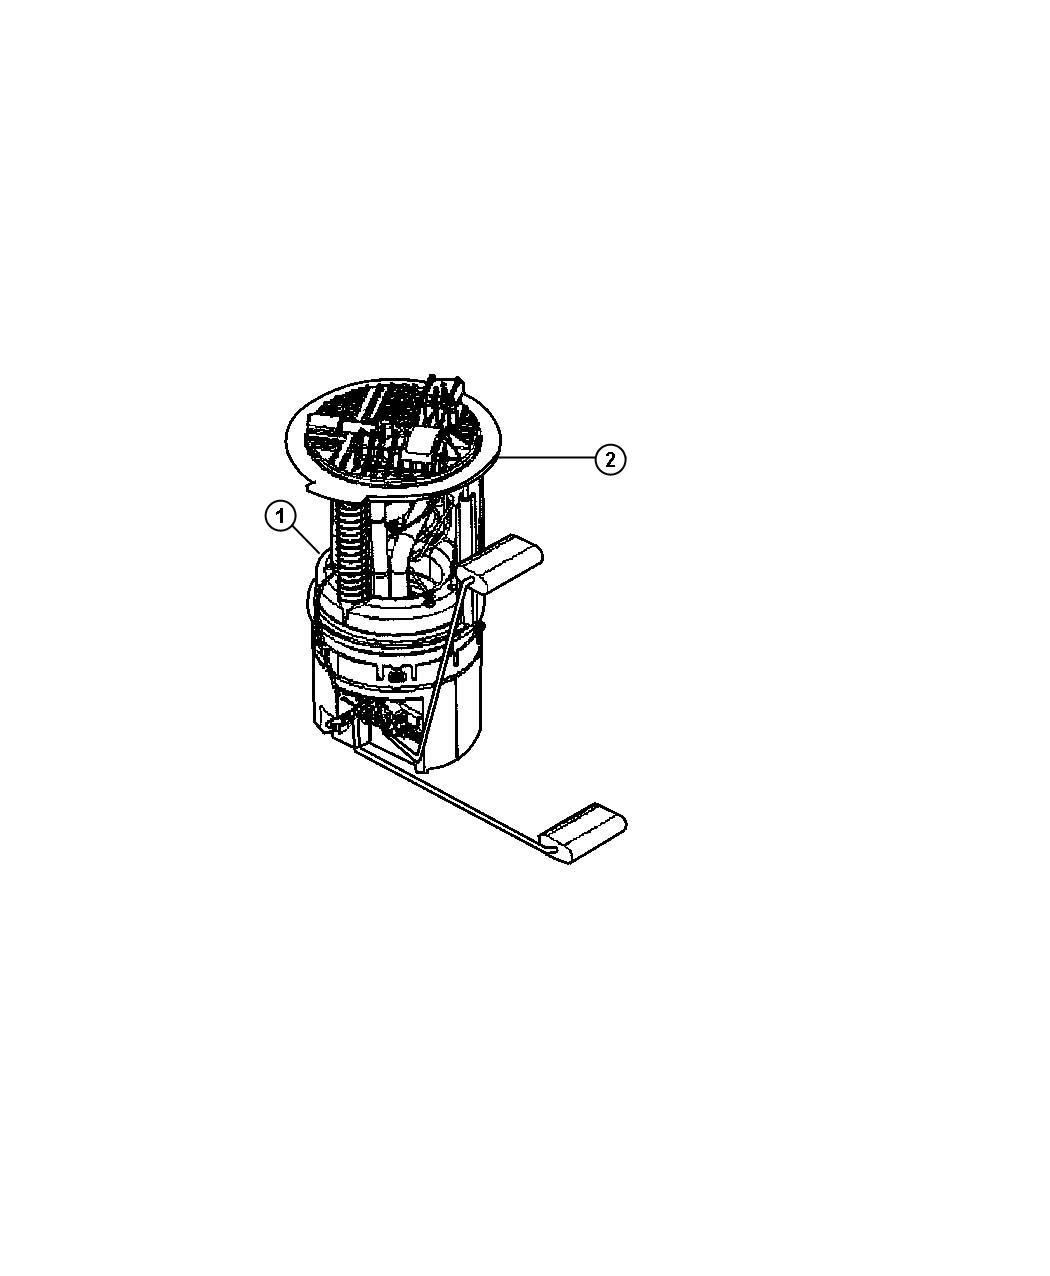 tags: #jeep wrangler transfer case diagram#jeep wrangler rear end diagram#jeep  wrangler ignition diagram#jeep wrangler hood diagram#jeep wrangler manifold